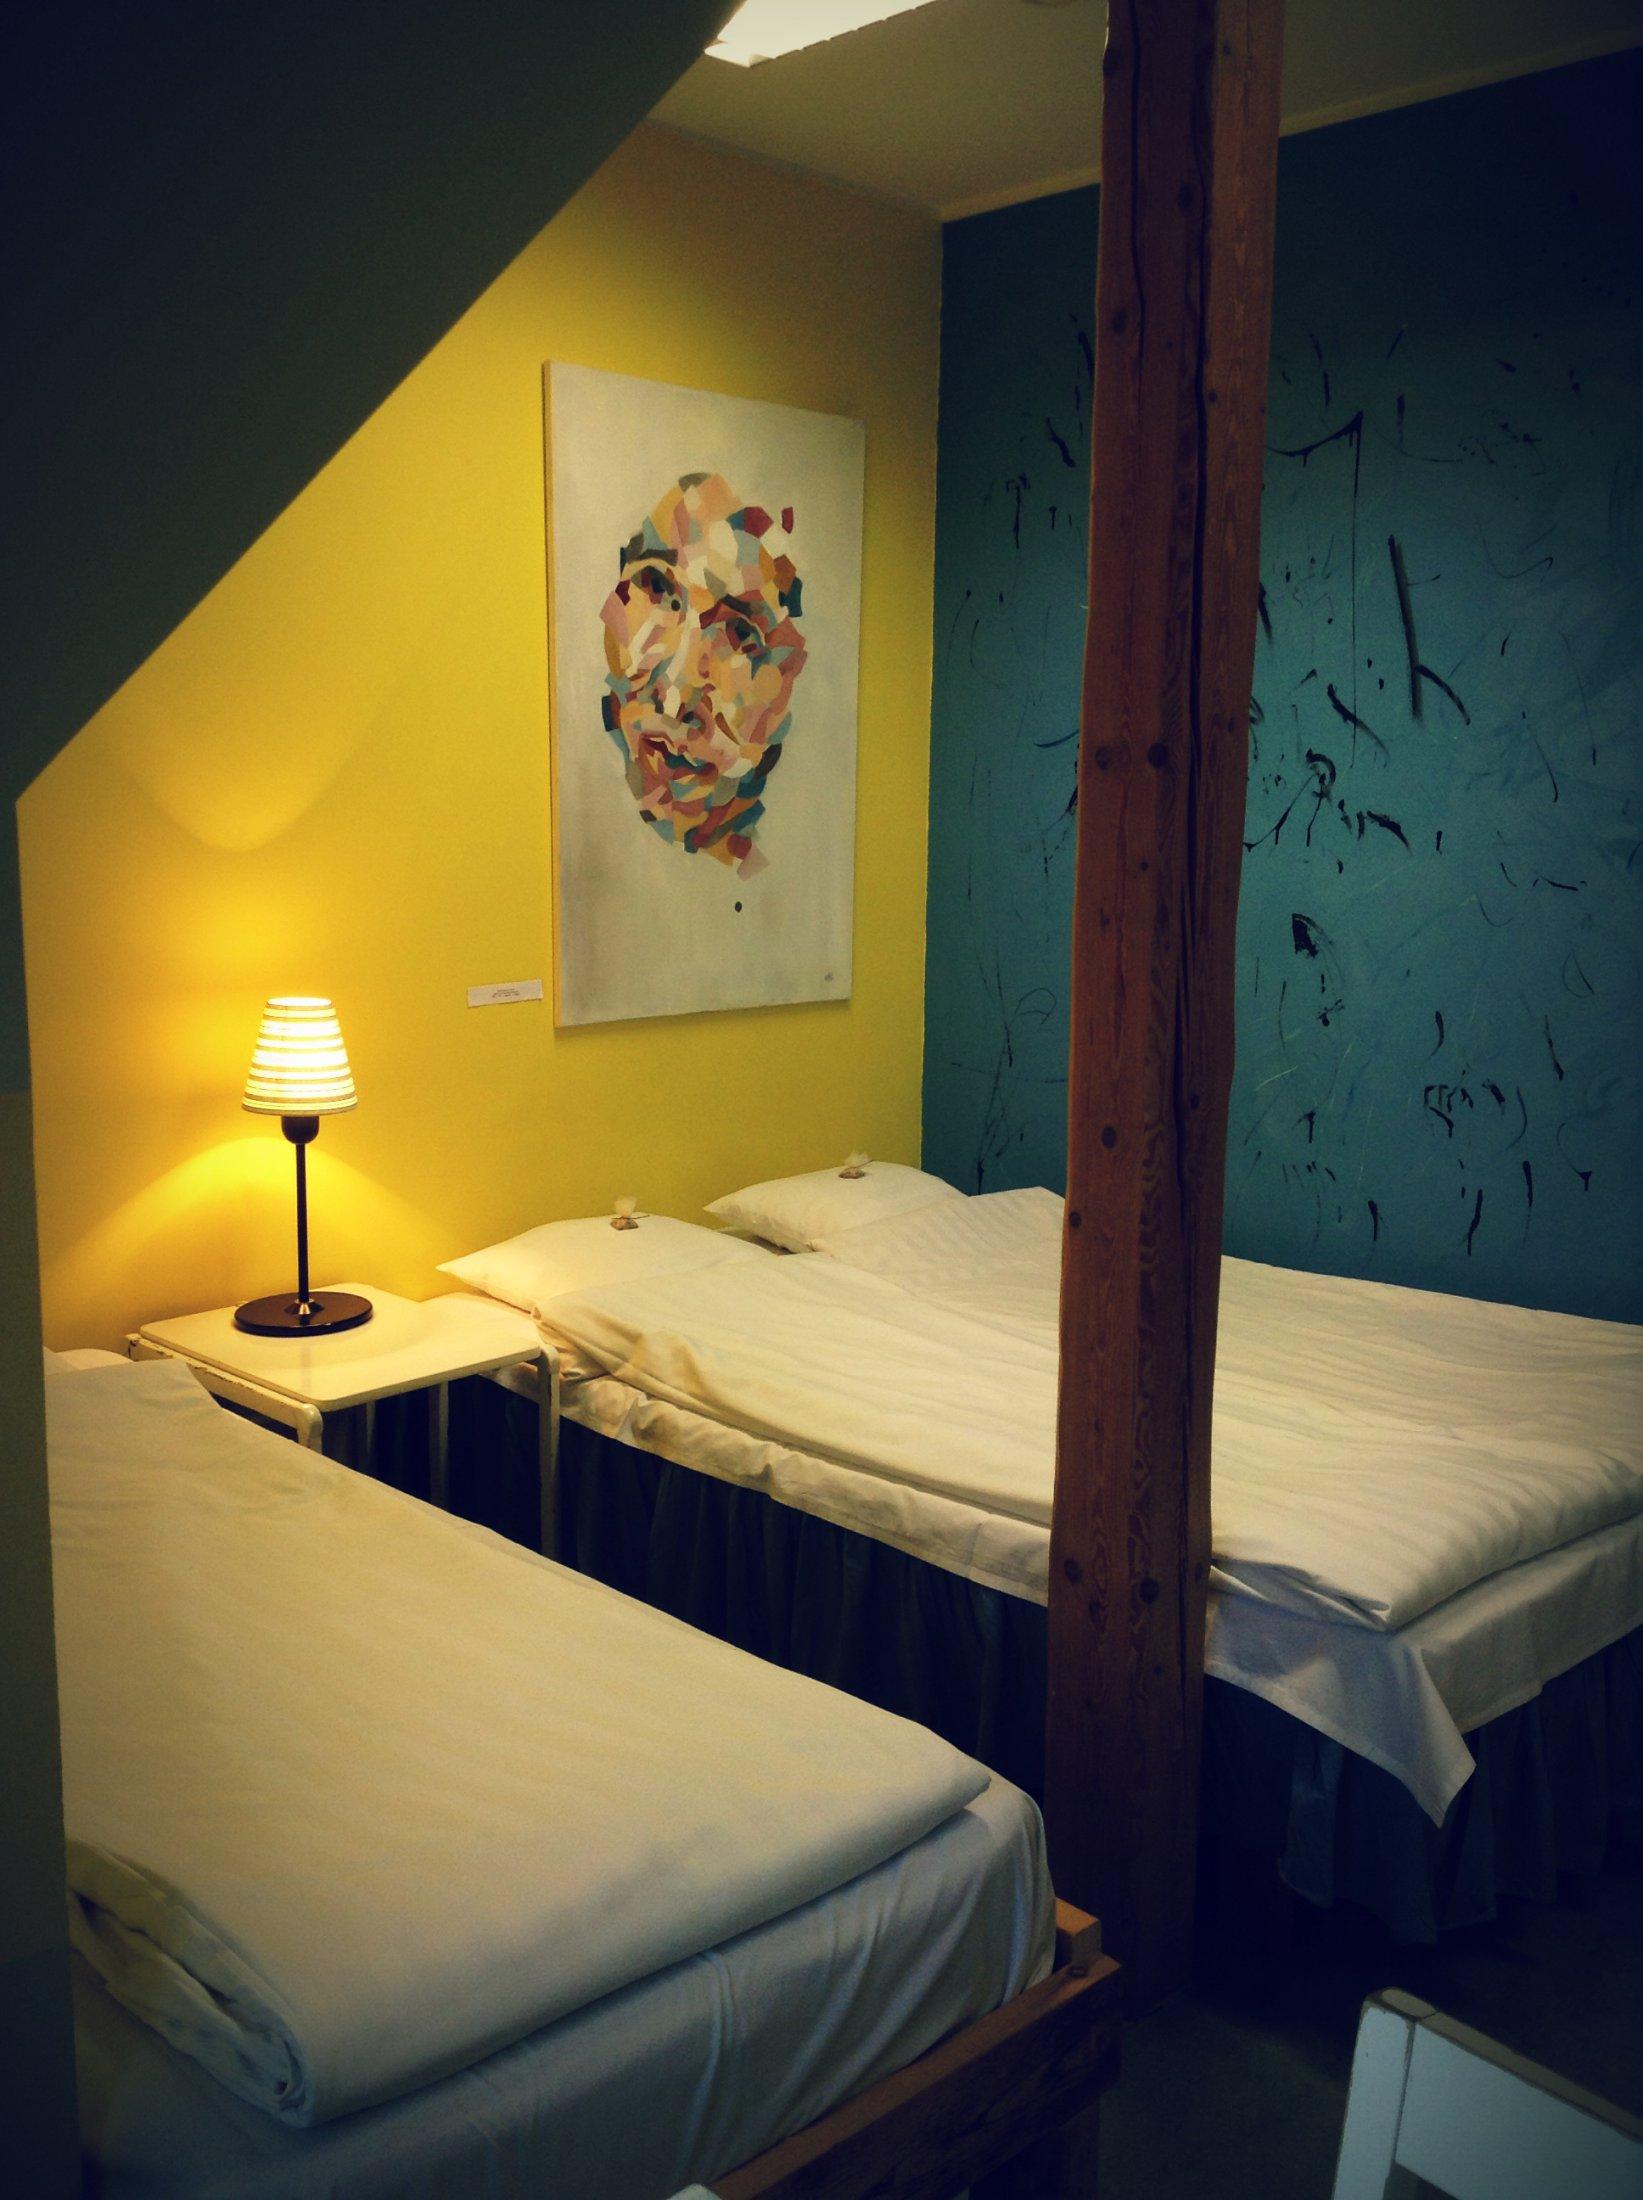 Double Room, Looming Hostel, Tartu Accommodation, Estonia